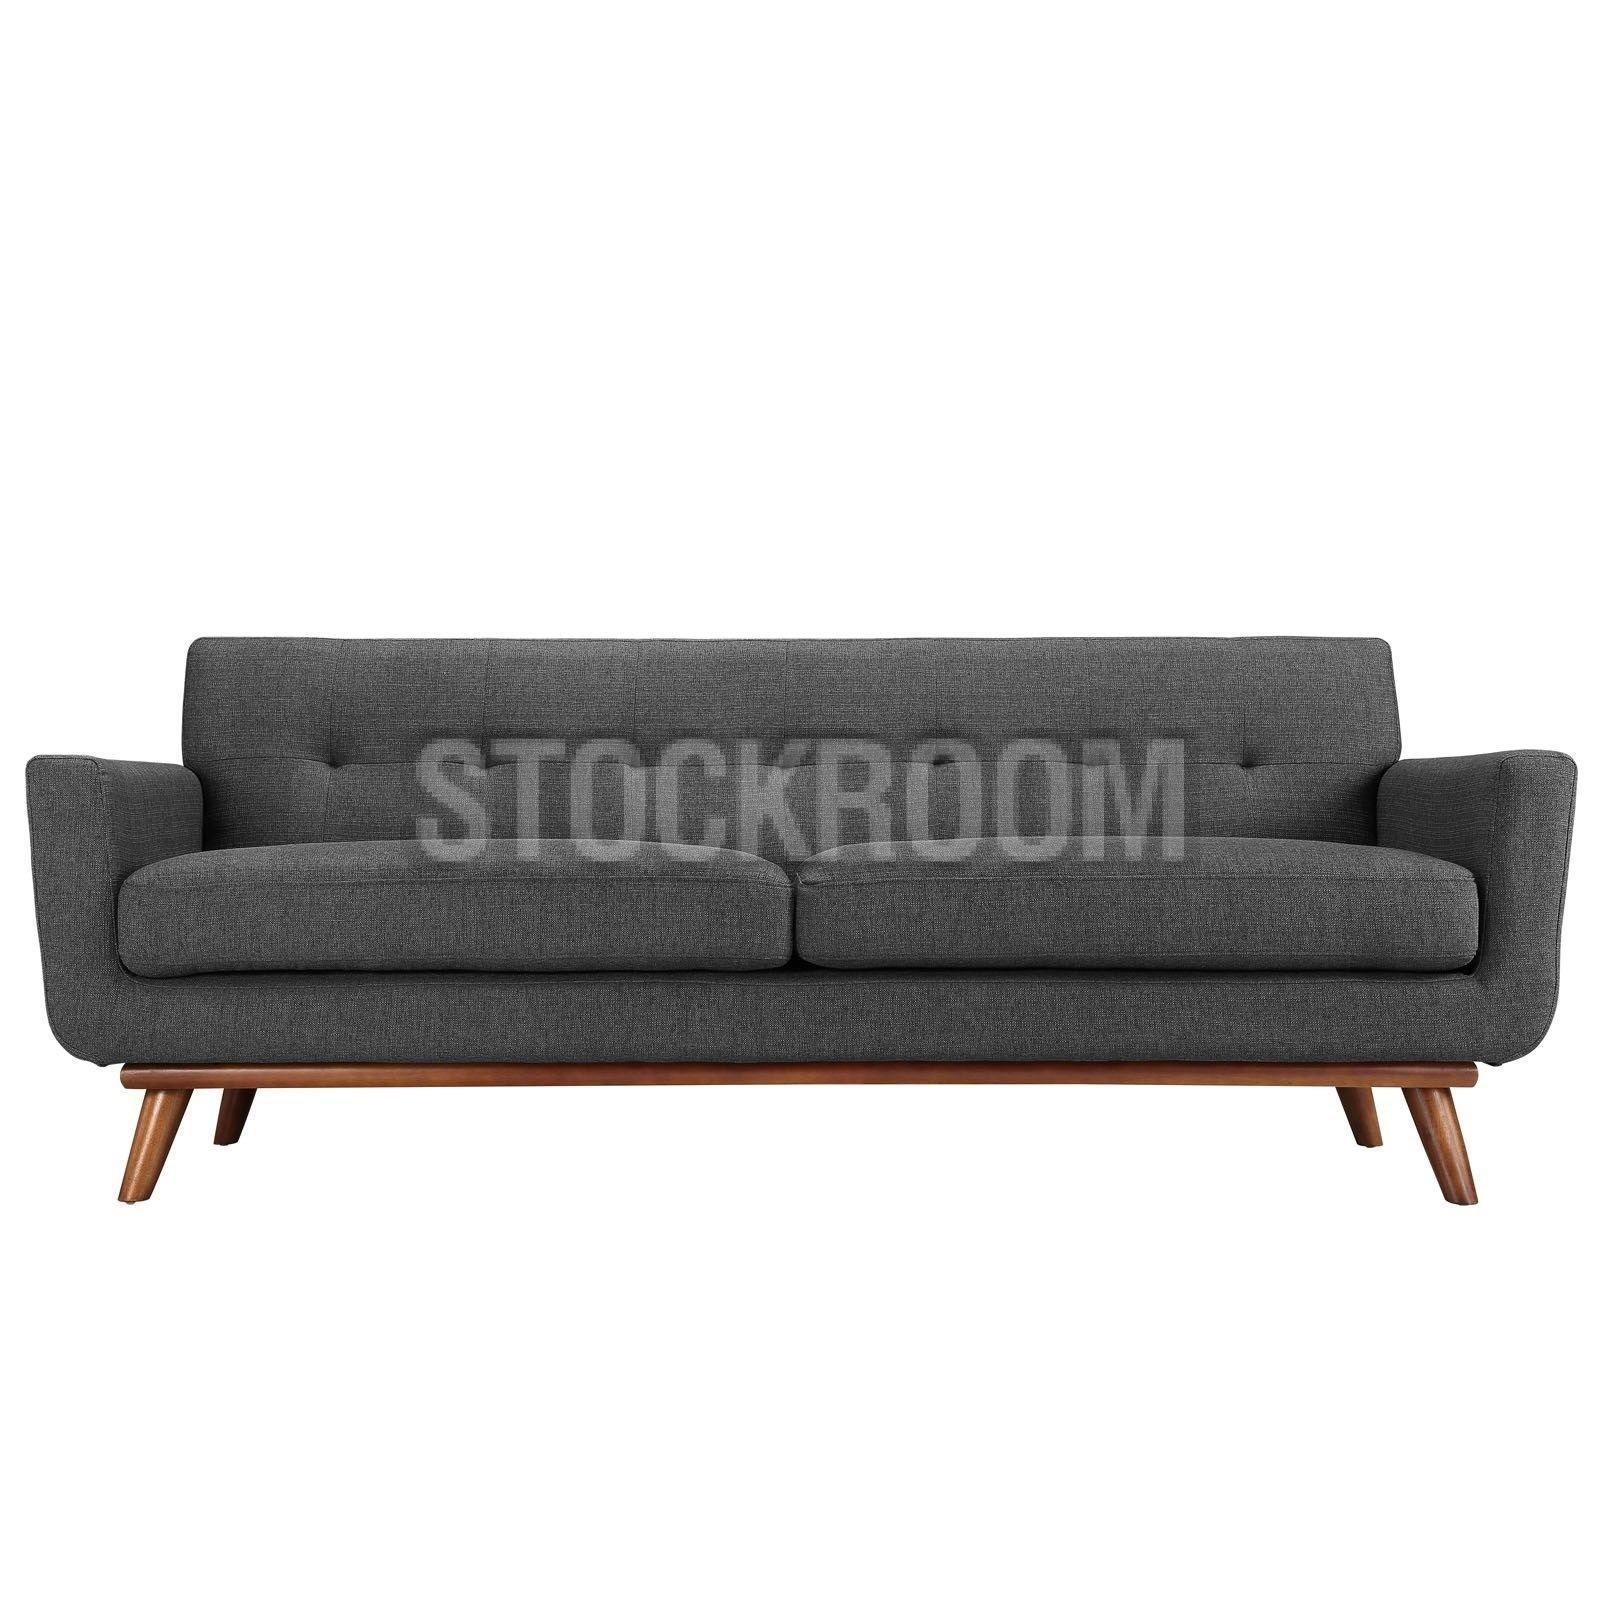 Aquarius Fabric Sofa 2 Seater : Stockroom Hong Kong Contemporary Pertaining To Aquarius Dark Grey Sofa Chairs (View 5 of 25)